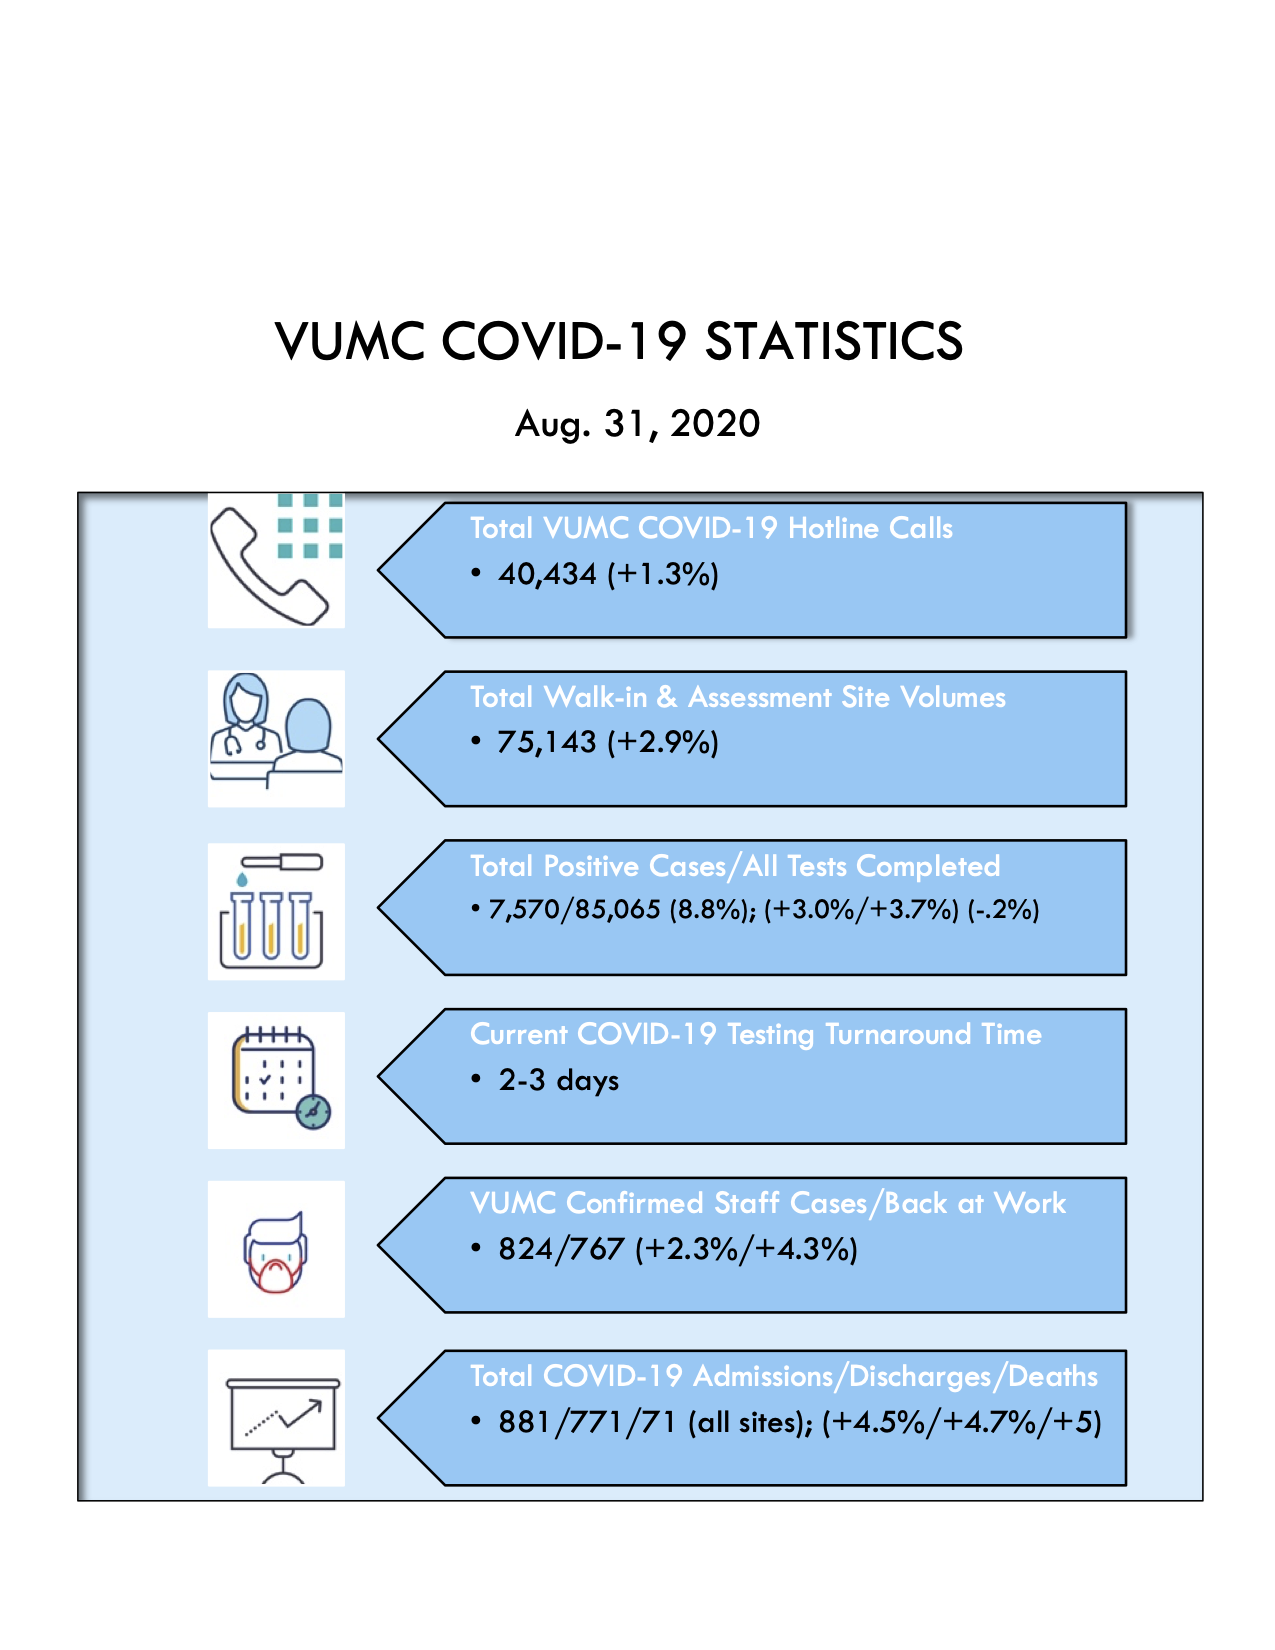 VUMC Covid Stats Aug 31